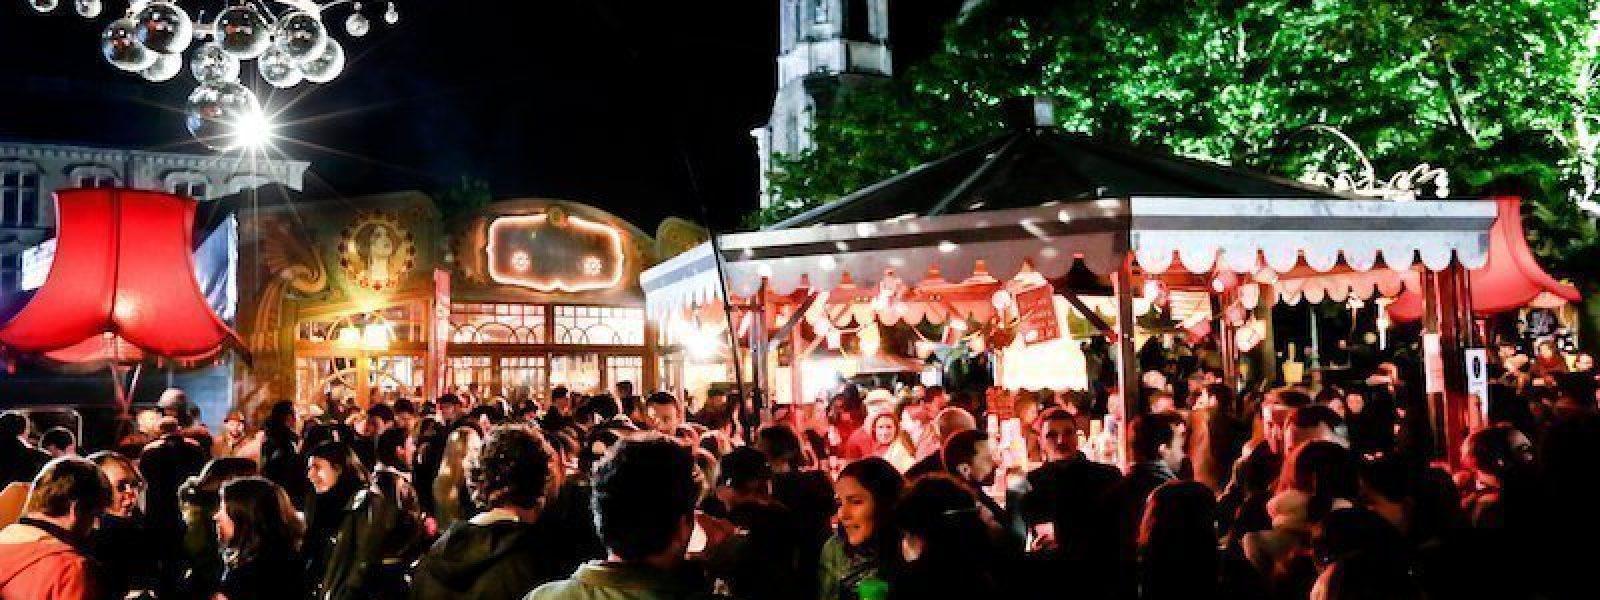 Festival Mythos à Rennes